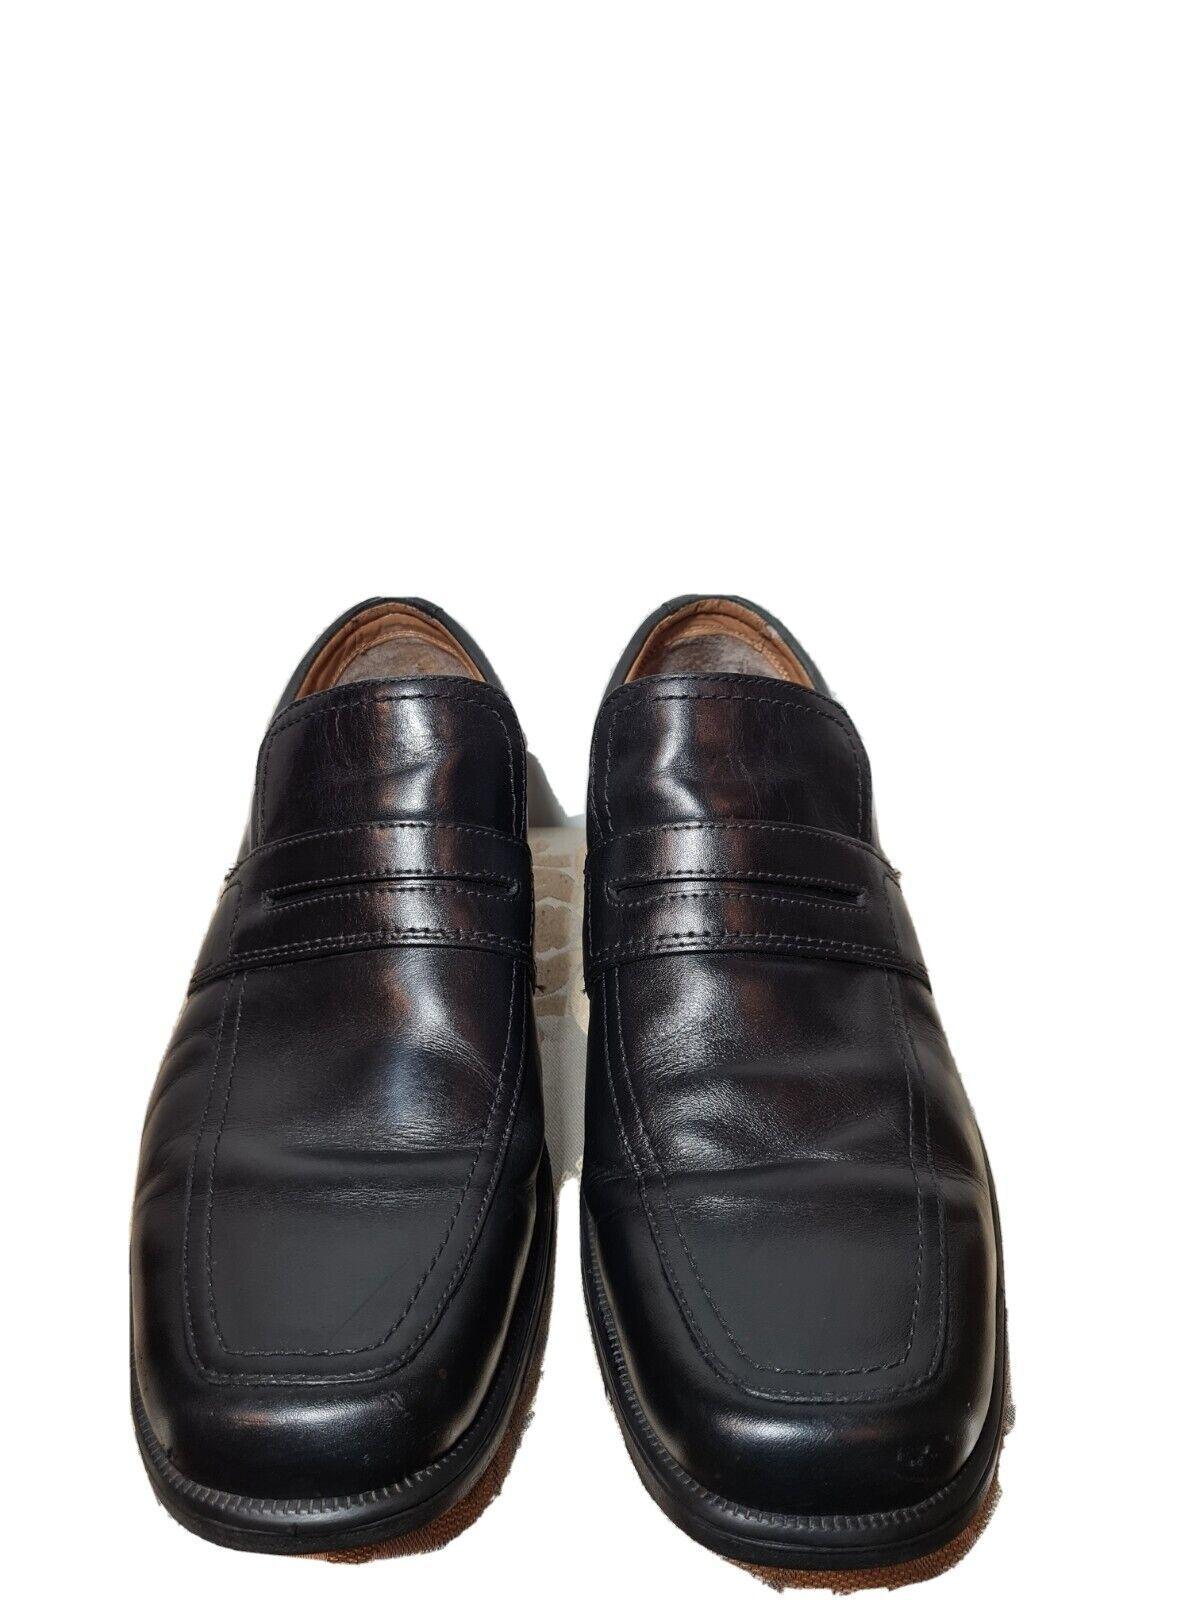 CLARKS Men's Leather Black Slip On Loafers UK Size 9G